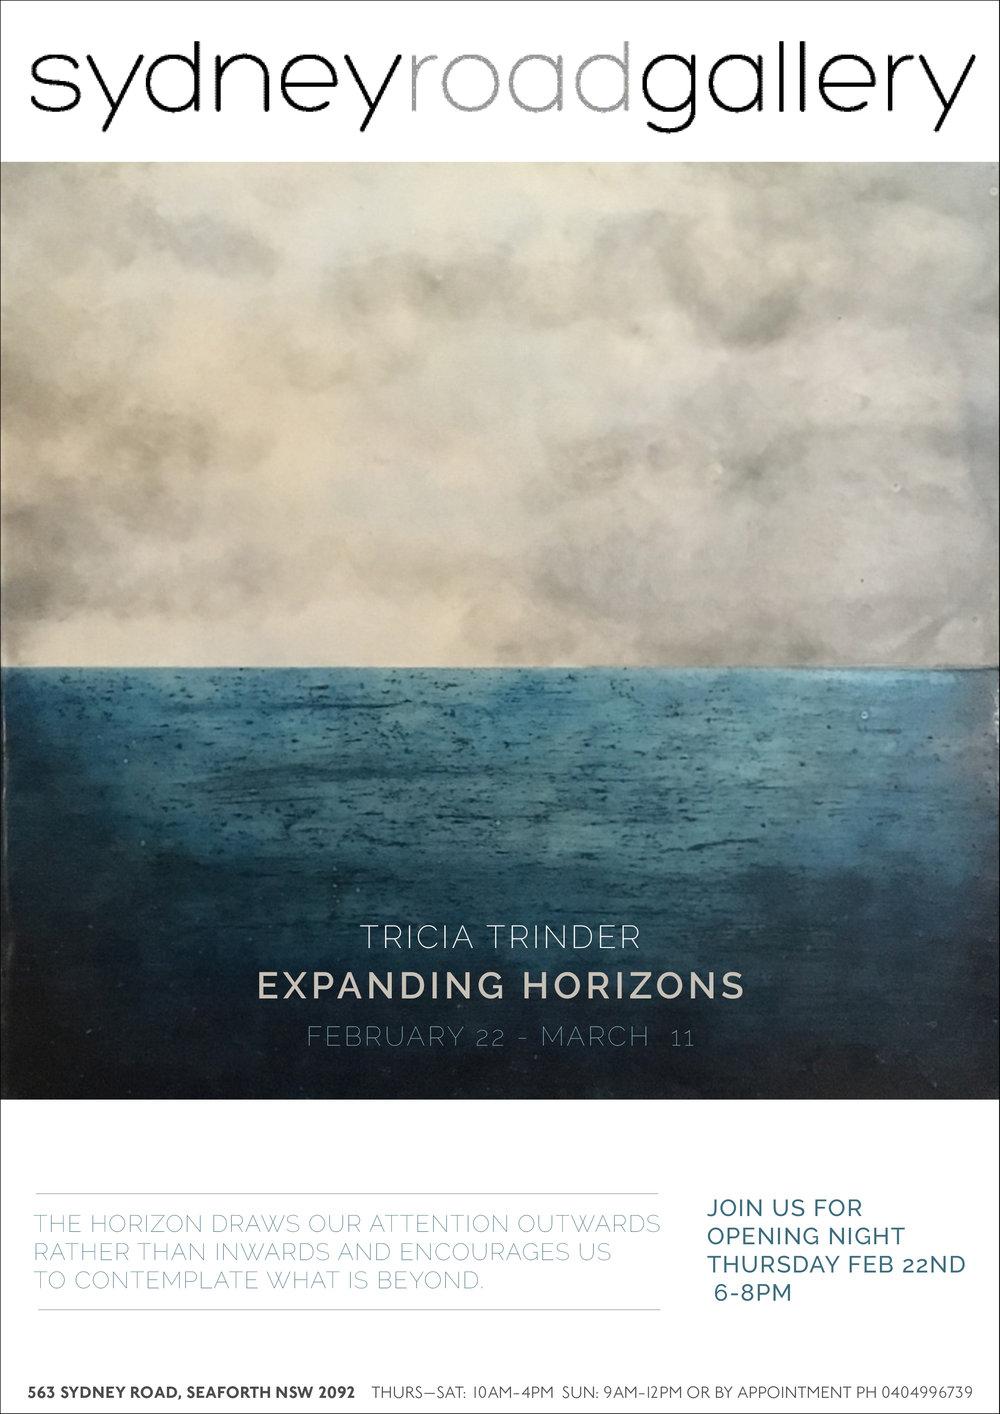 ExpandingHorizons +STUDIO STORIES - February 22 – March 18